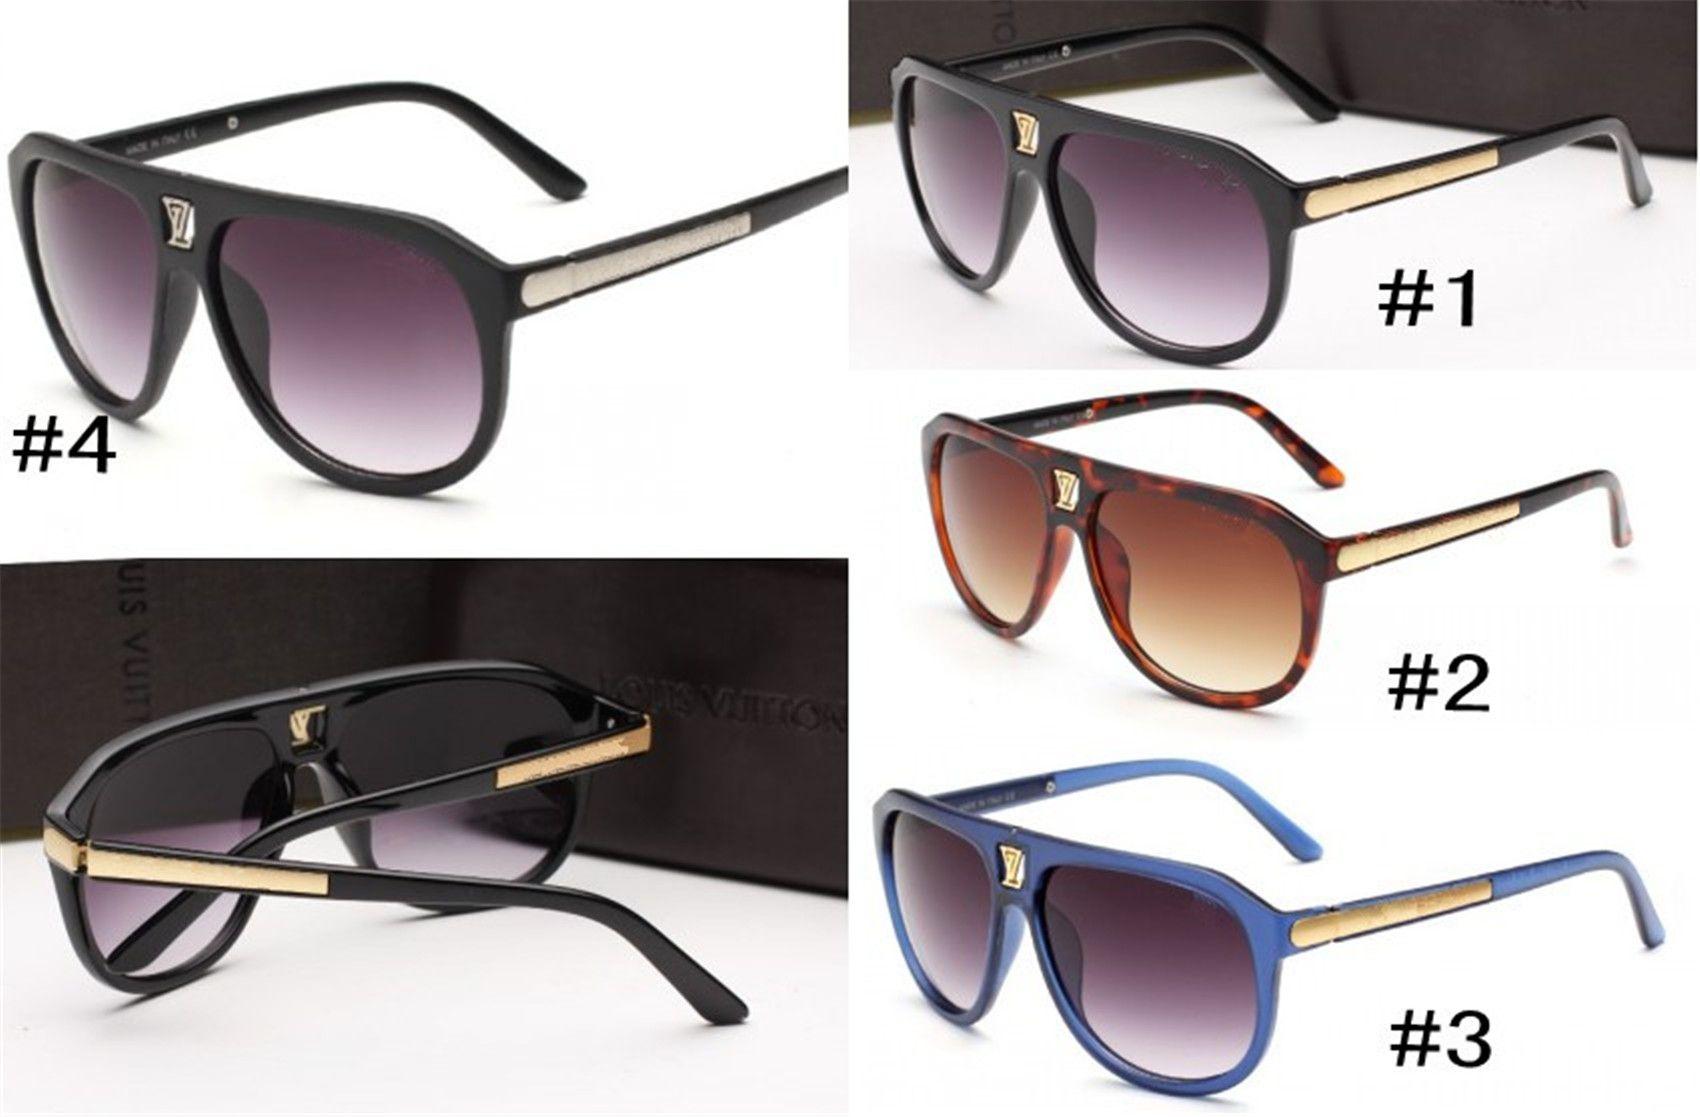 MOQ = 10pcs, French 9018 Mode Designer Brand Sunglasses Femmes Hommes Beauté Big Cadre Eyewear Femelle Ombre Summer Goggle Verres de plage